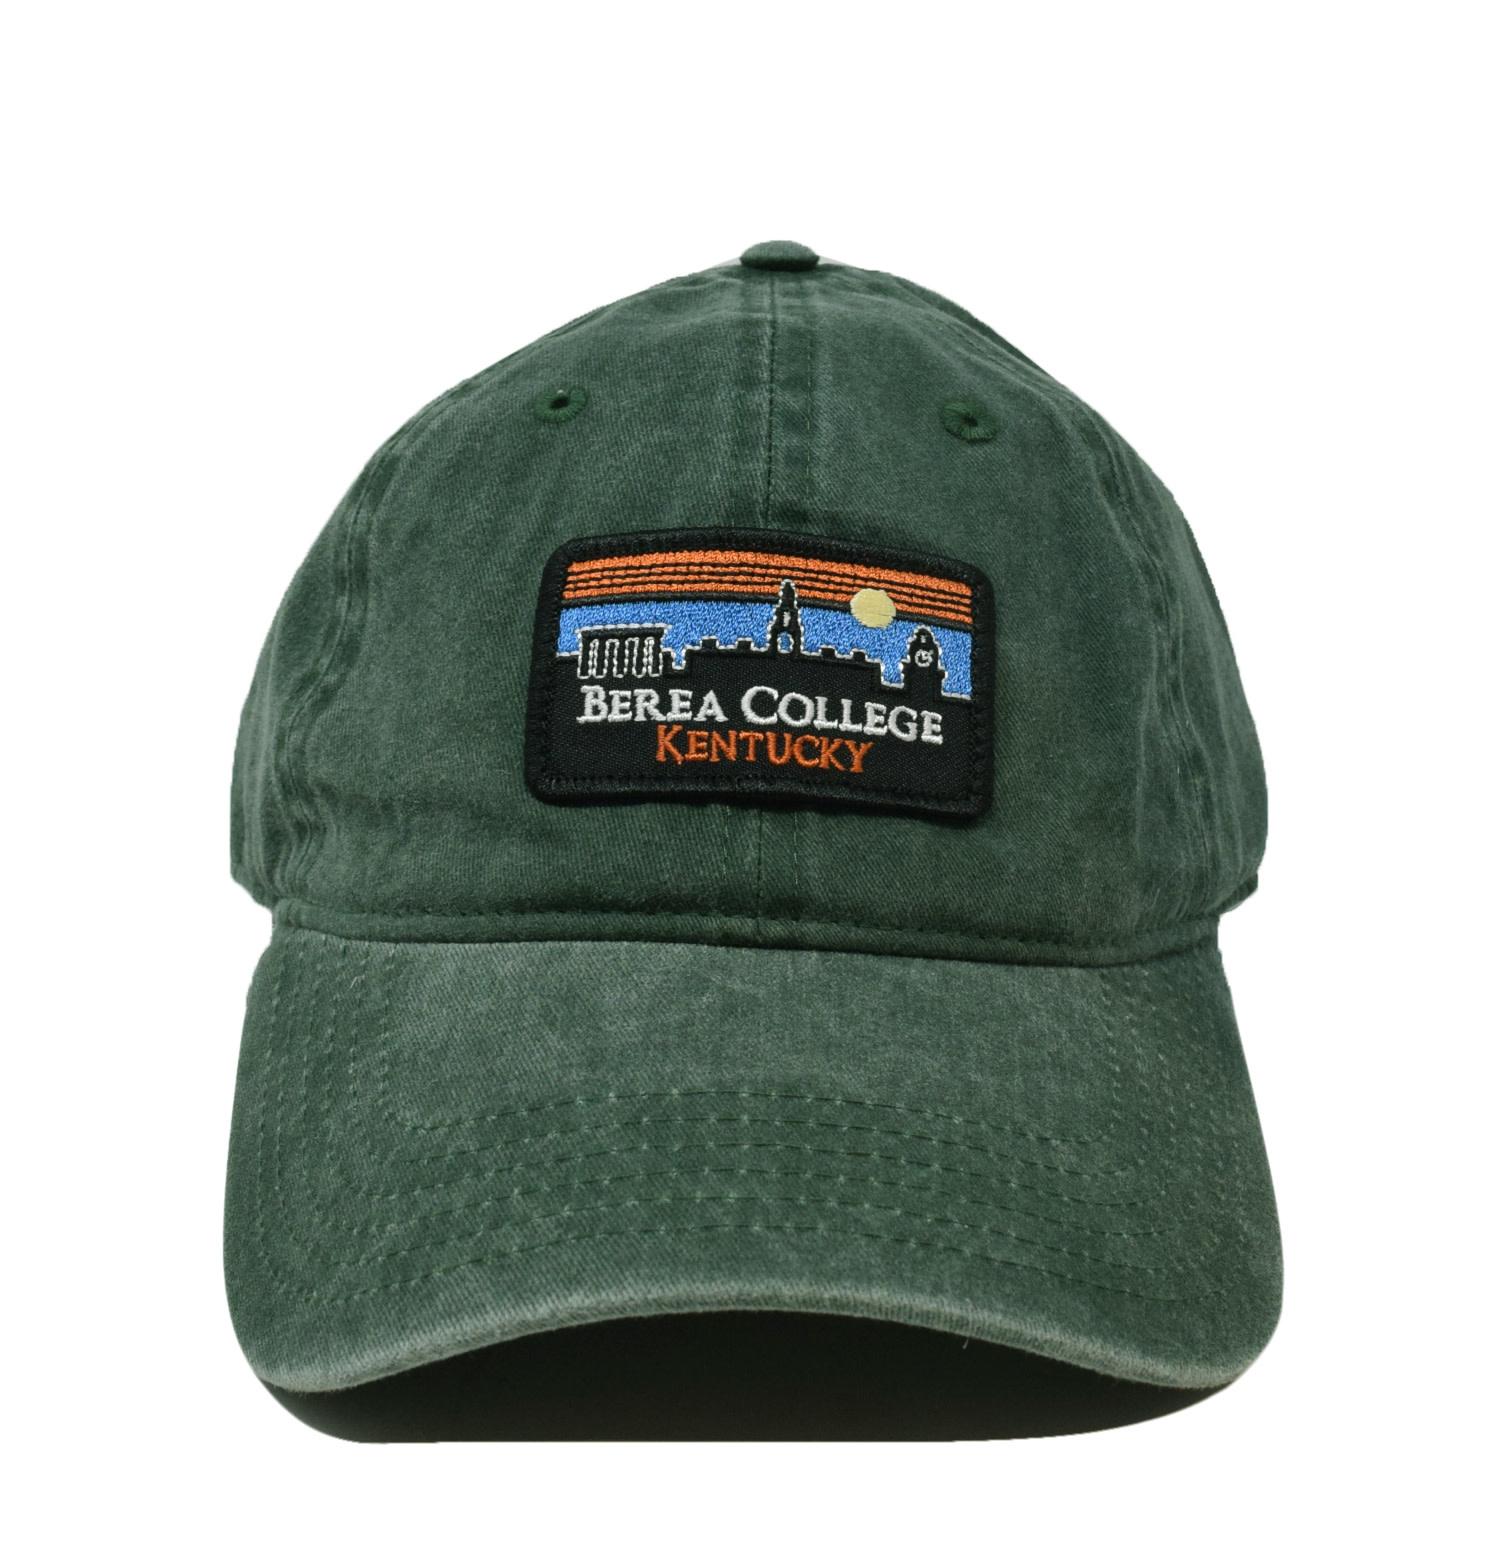 Berea College Retro Patch Vintage Ball Cap-2